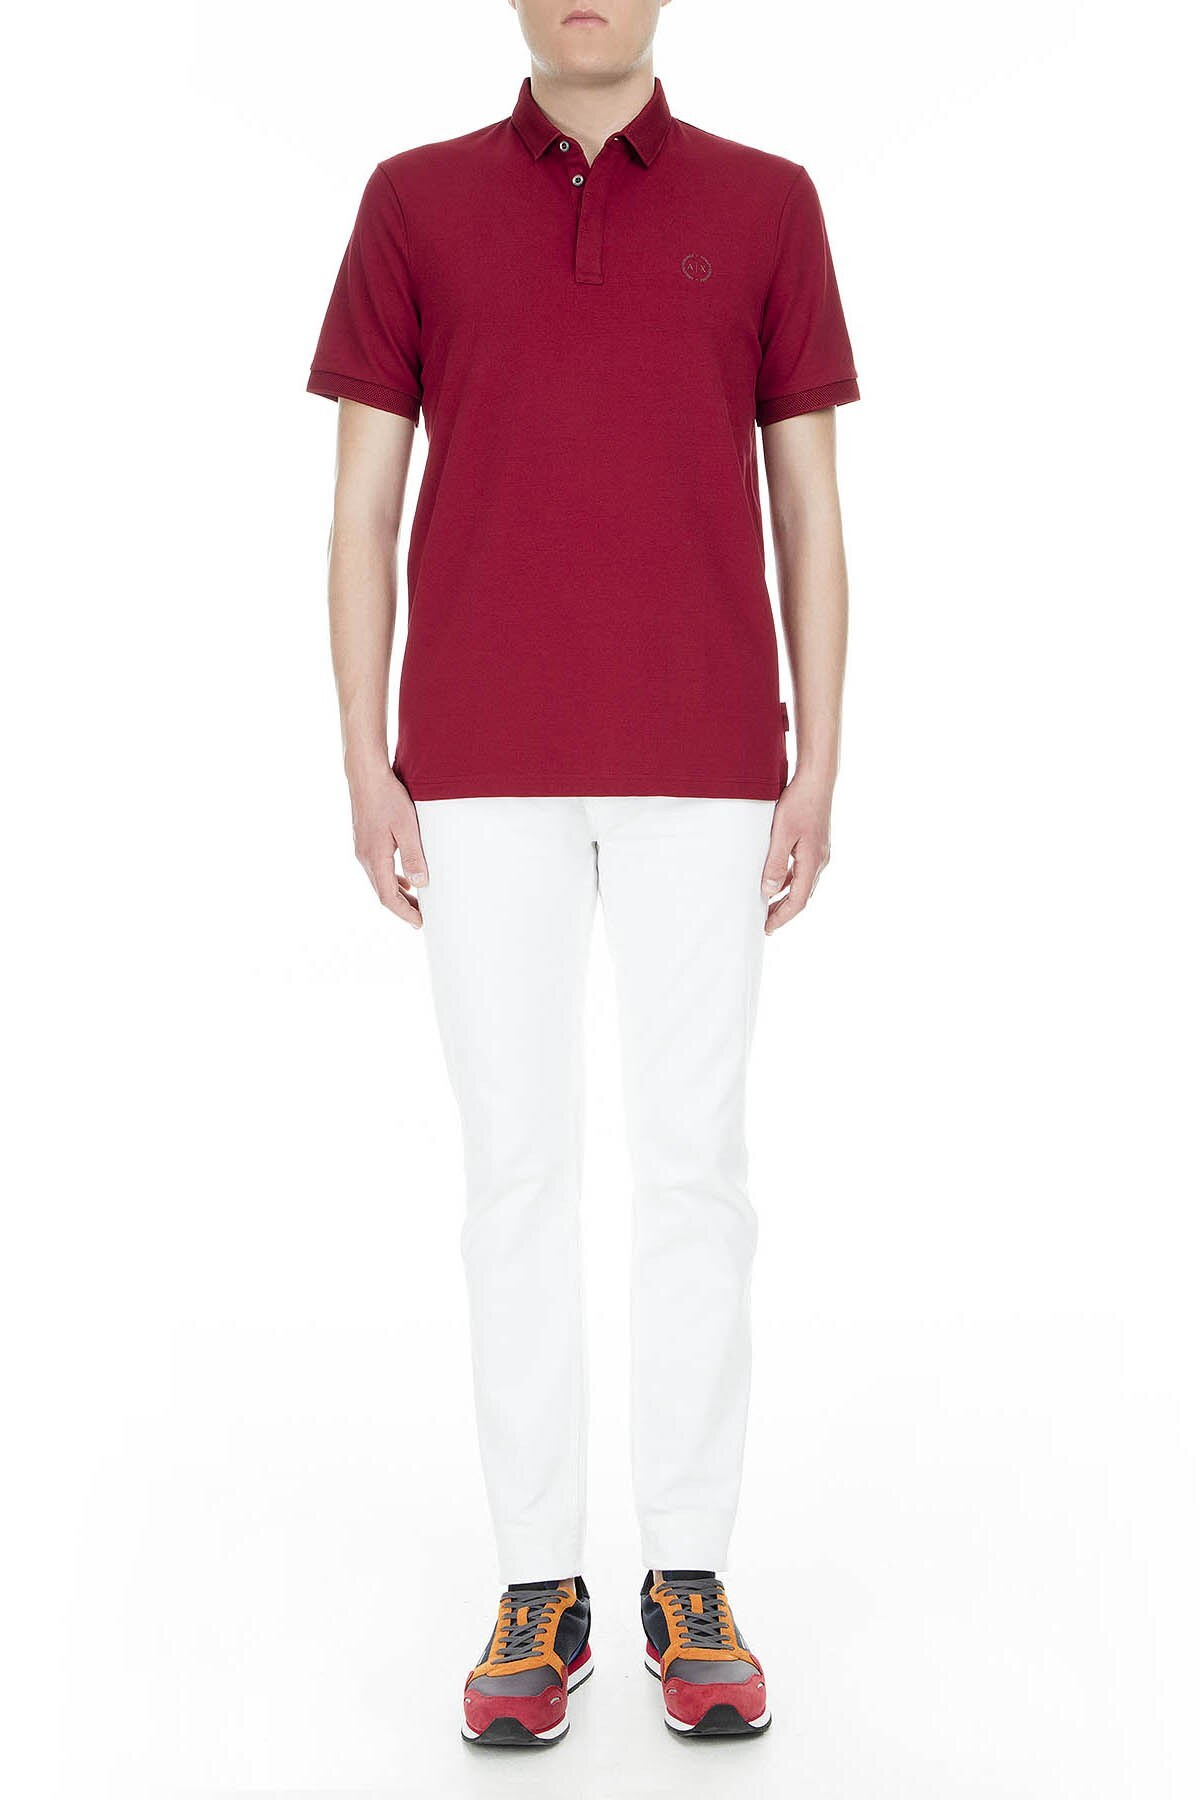 Armani Exchange Erkek T Shirt 8NZF91 ZJ81Z 1457 KIRMIZI